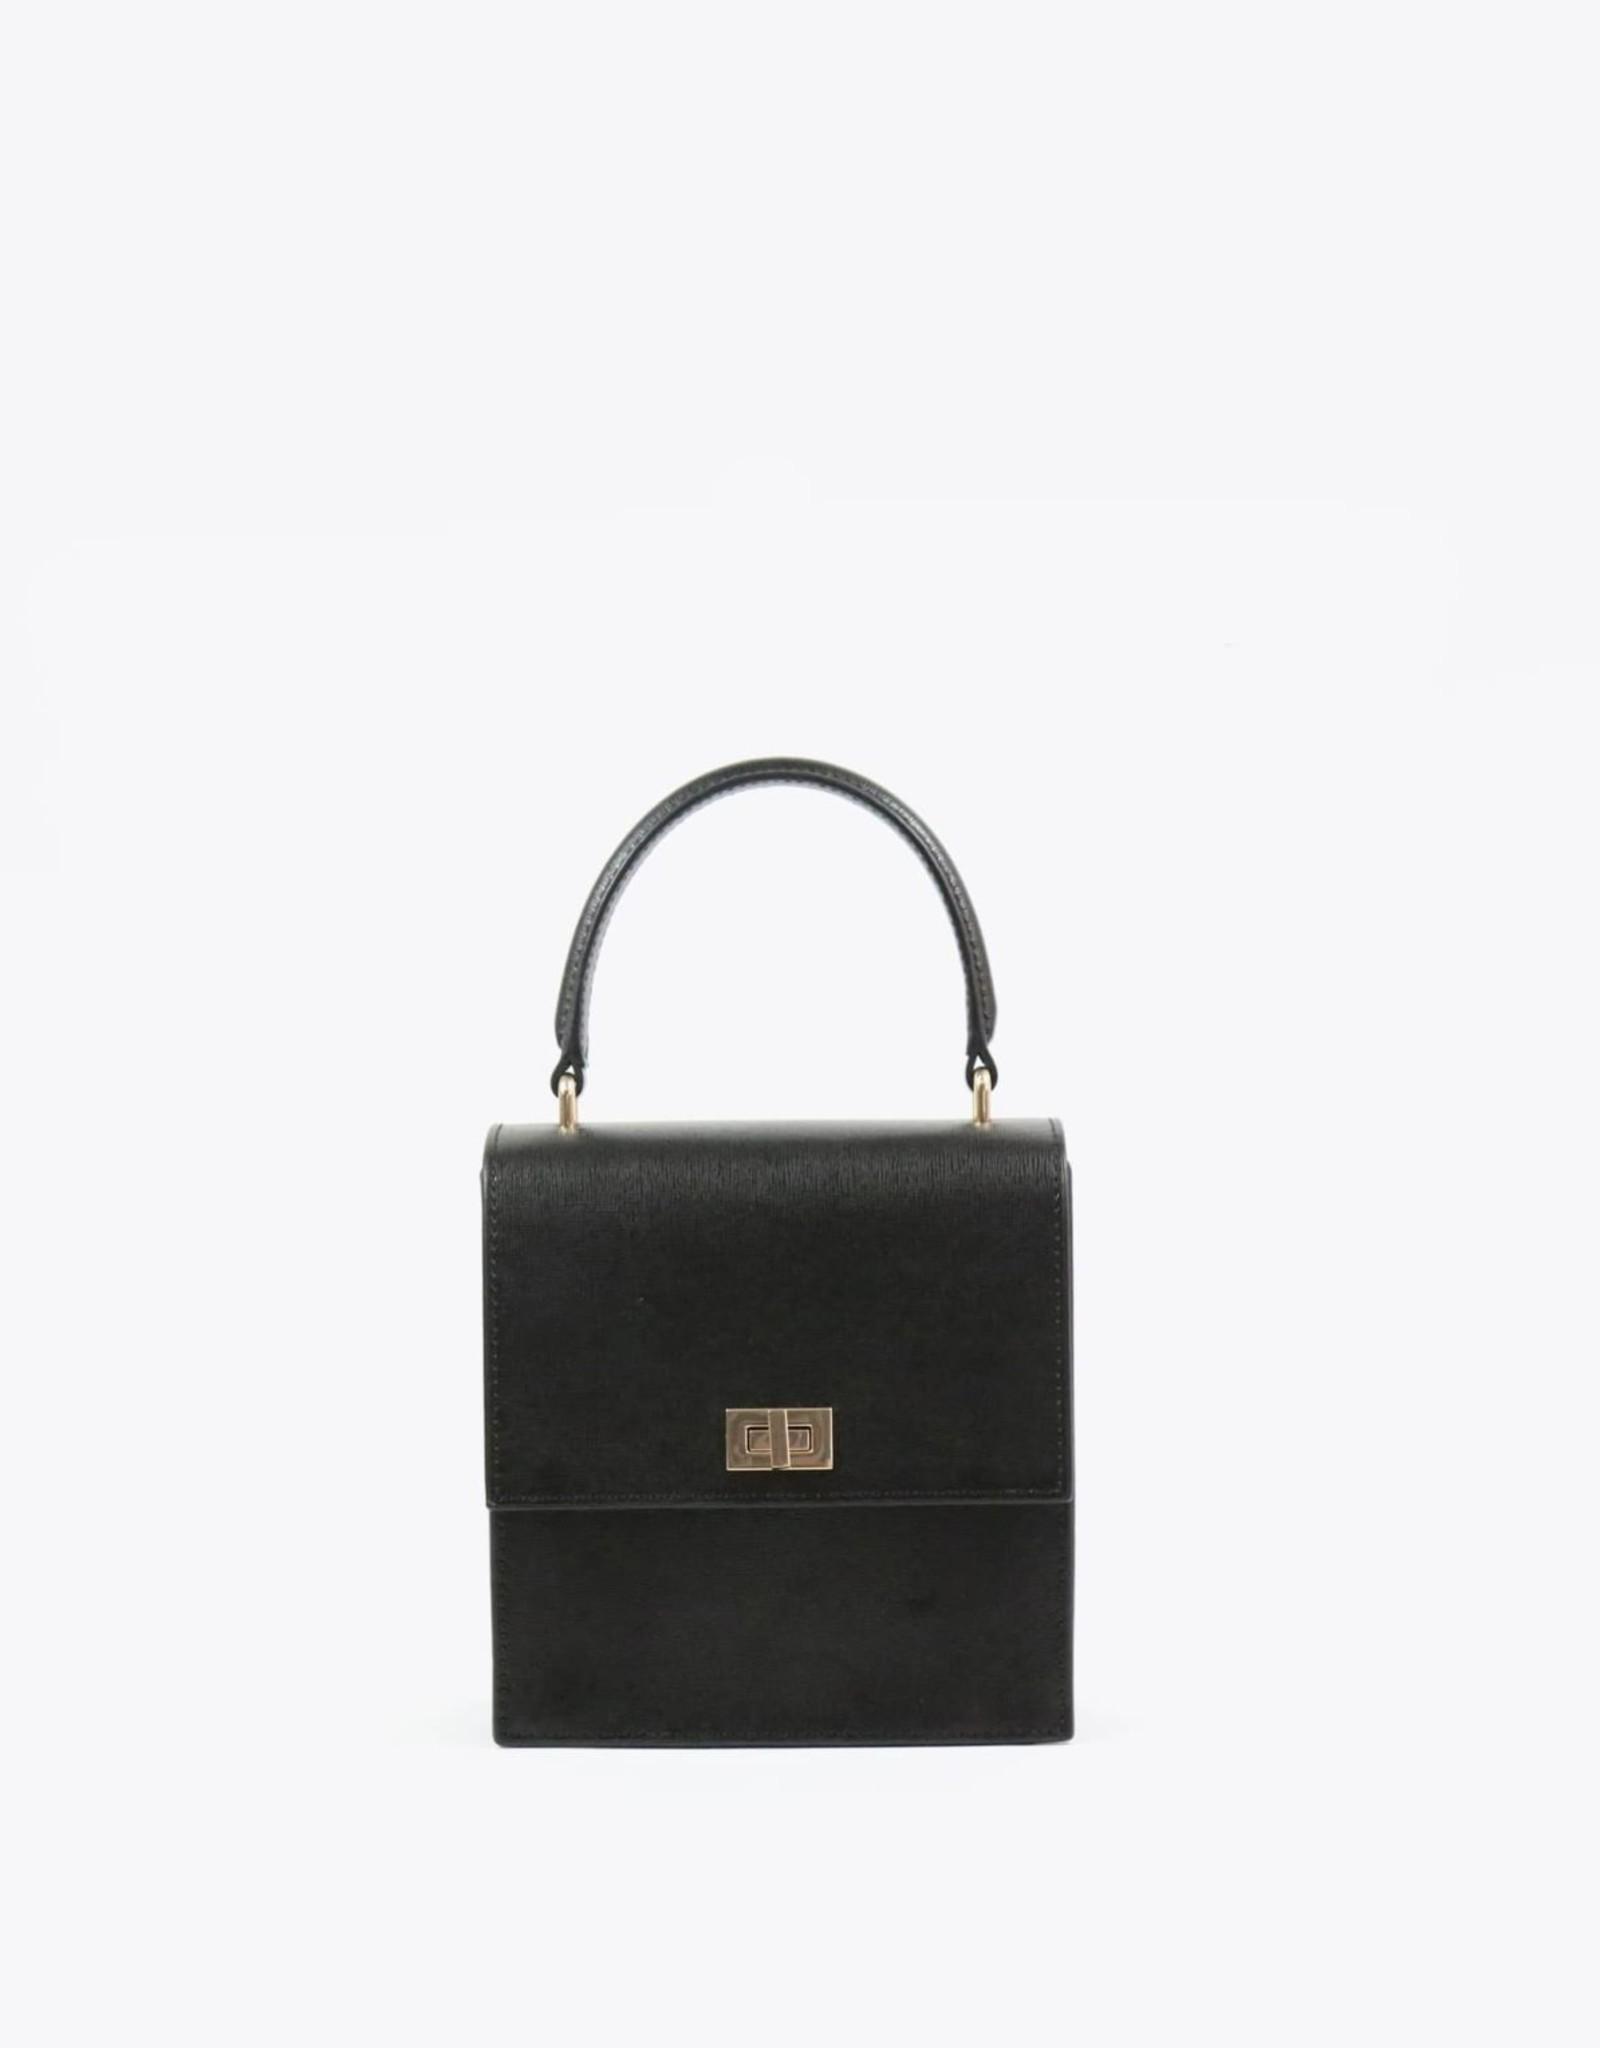 Neely & Chloe Mini Lady Bag - Black Saffiano